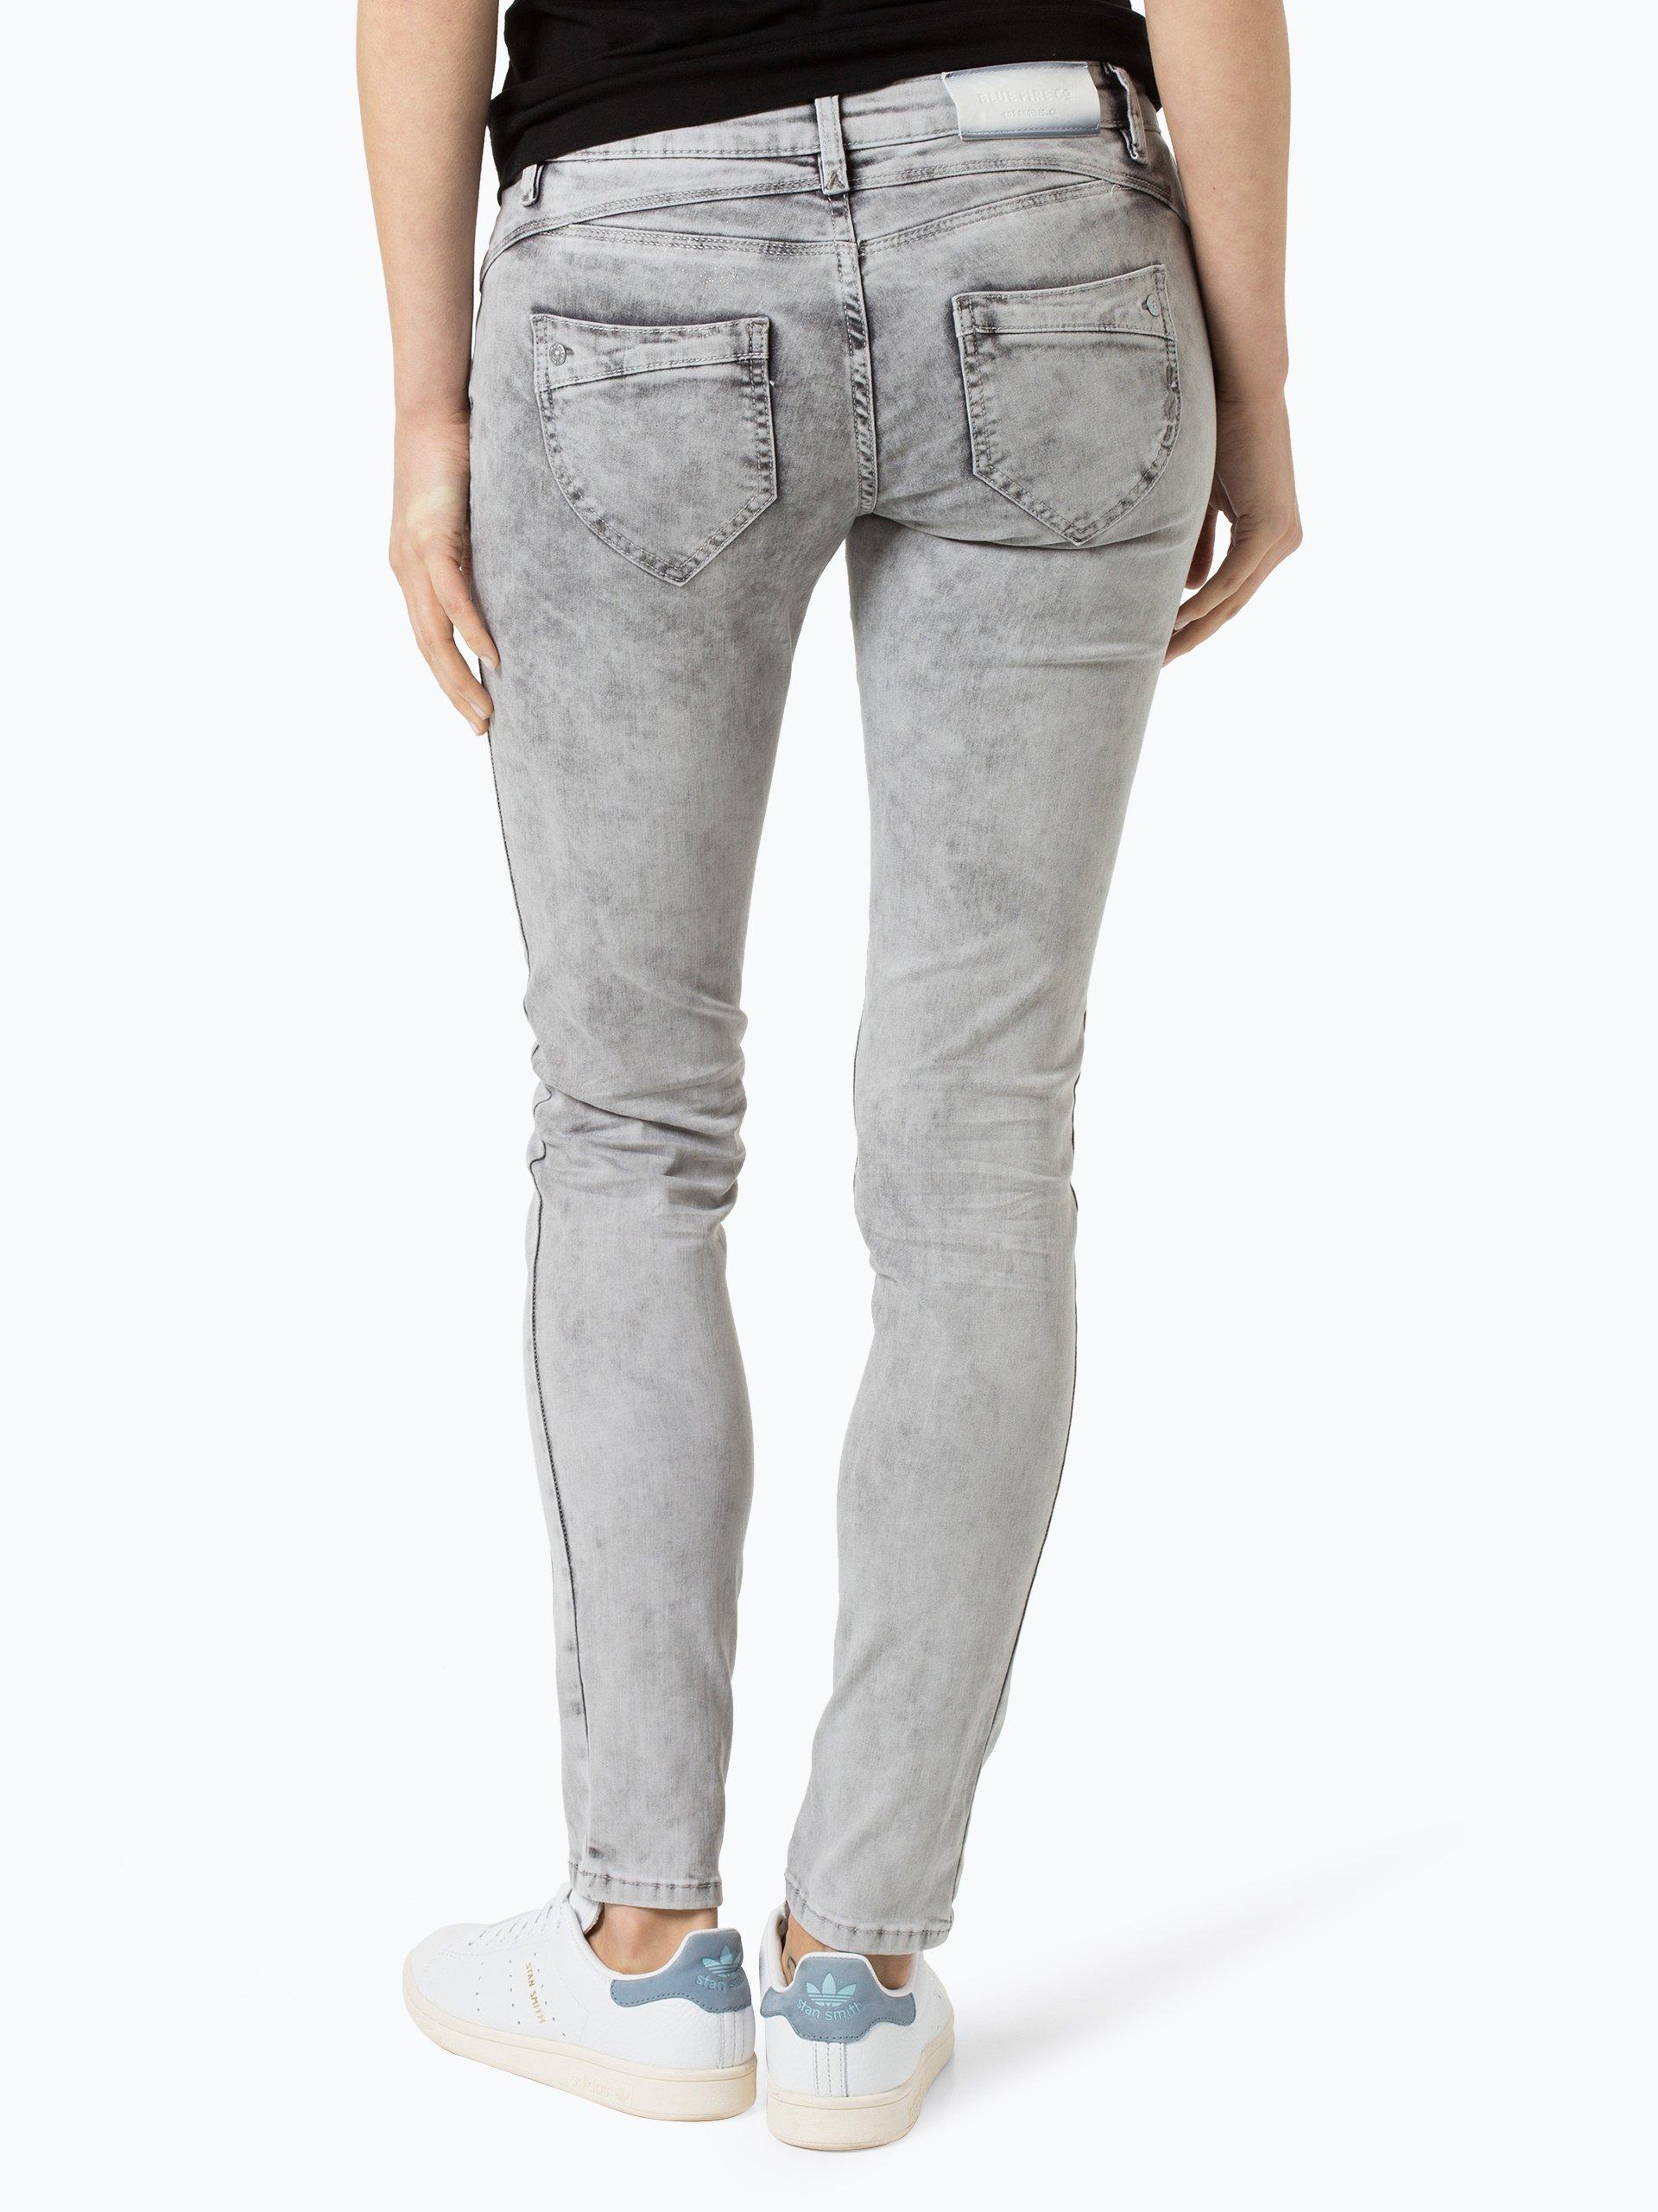 blue fire damen jeans anthrazit uni online kaufen peek. Black Bedroom Furniture Sets. Home Design Ideas